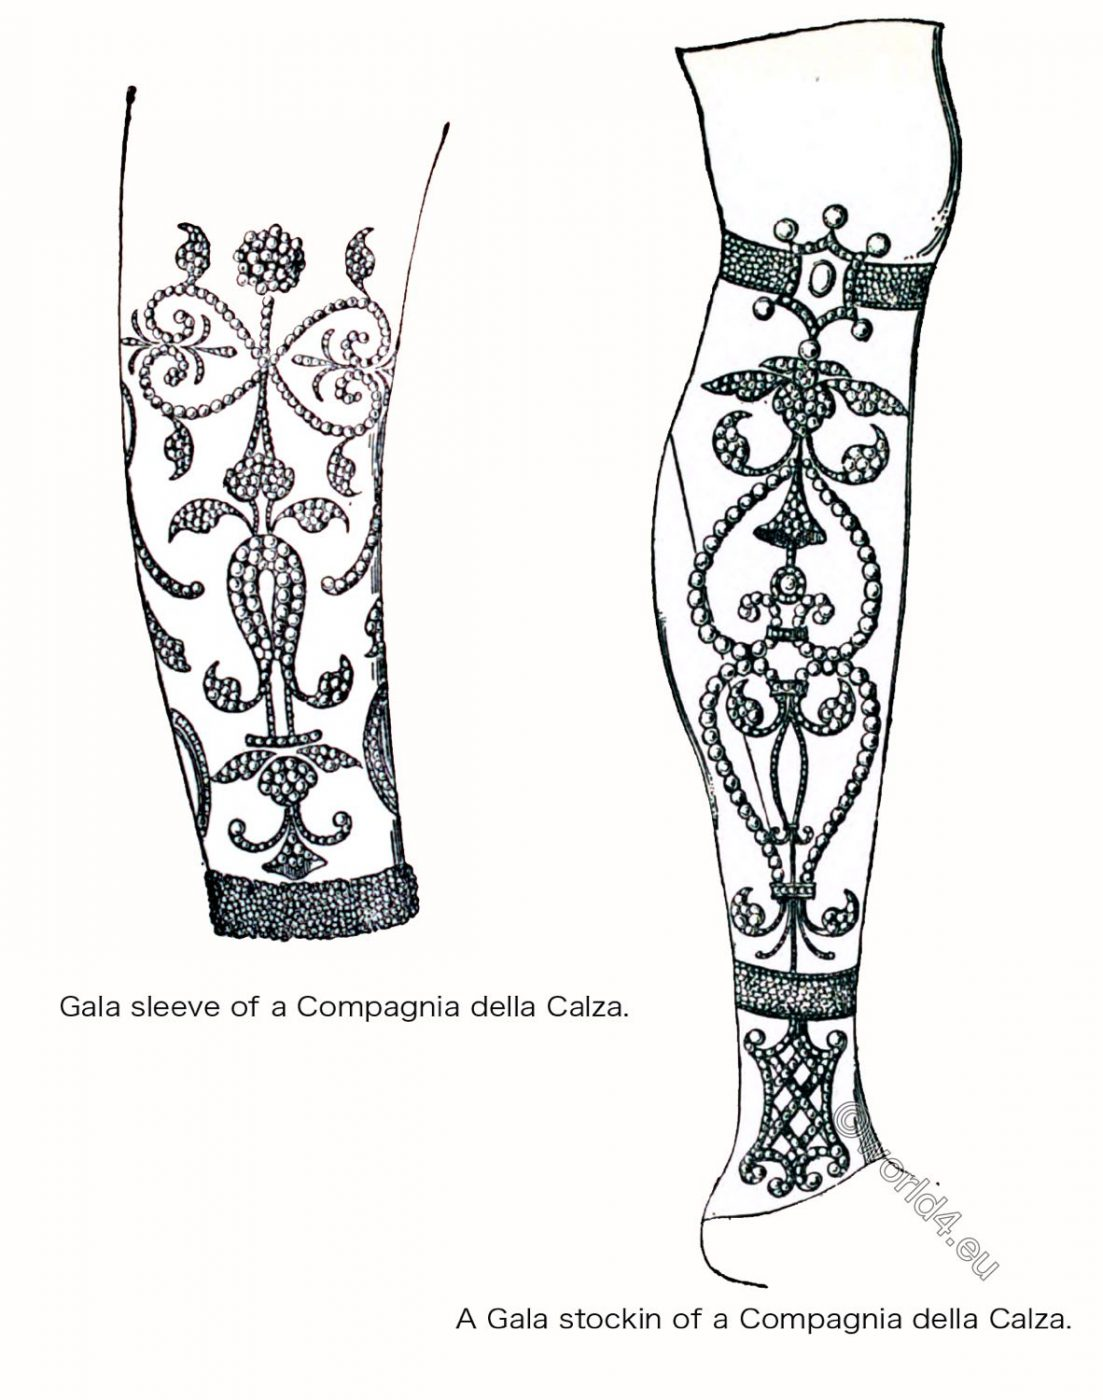 calza, Compagnia, compagne, renaissance, Venice, stocking, sleeve, fashion costume